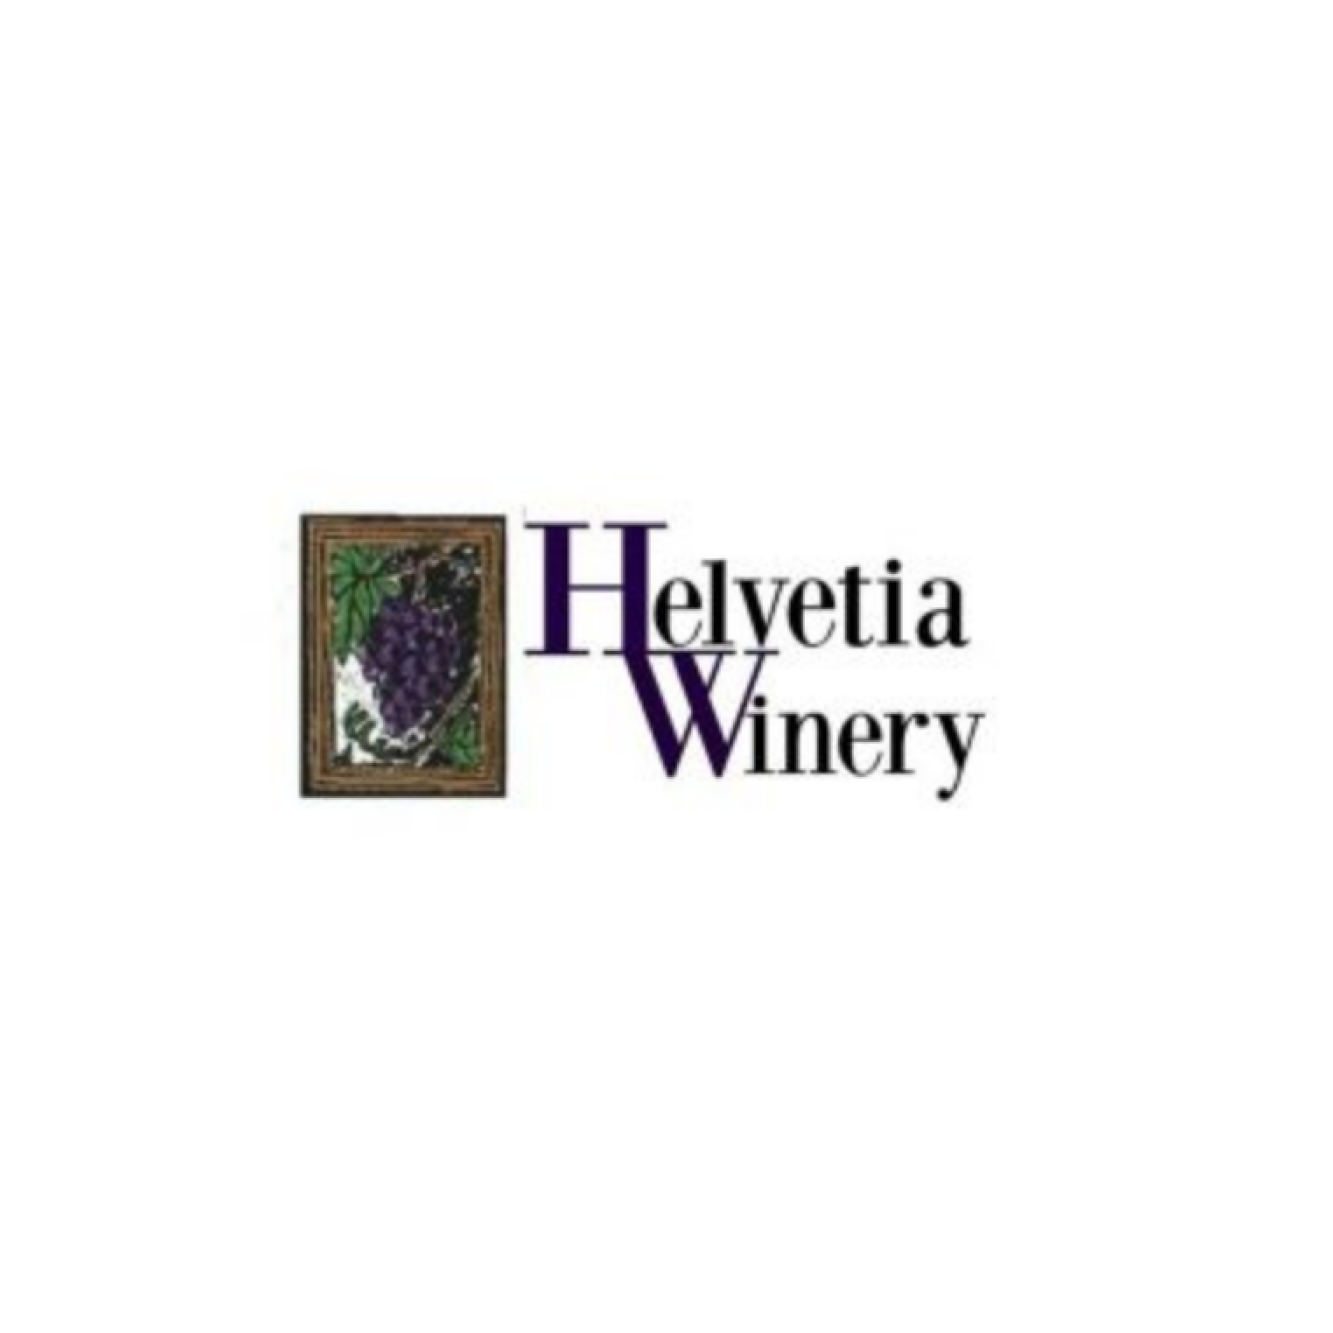 Helvetia Winery.jpg